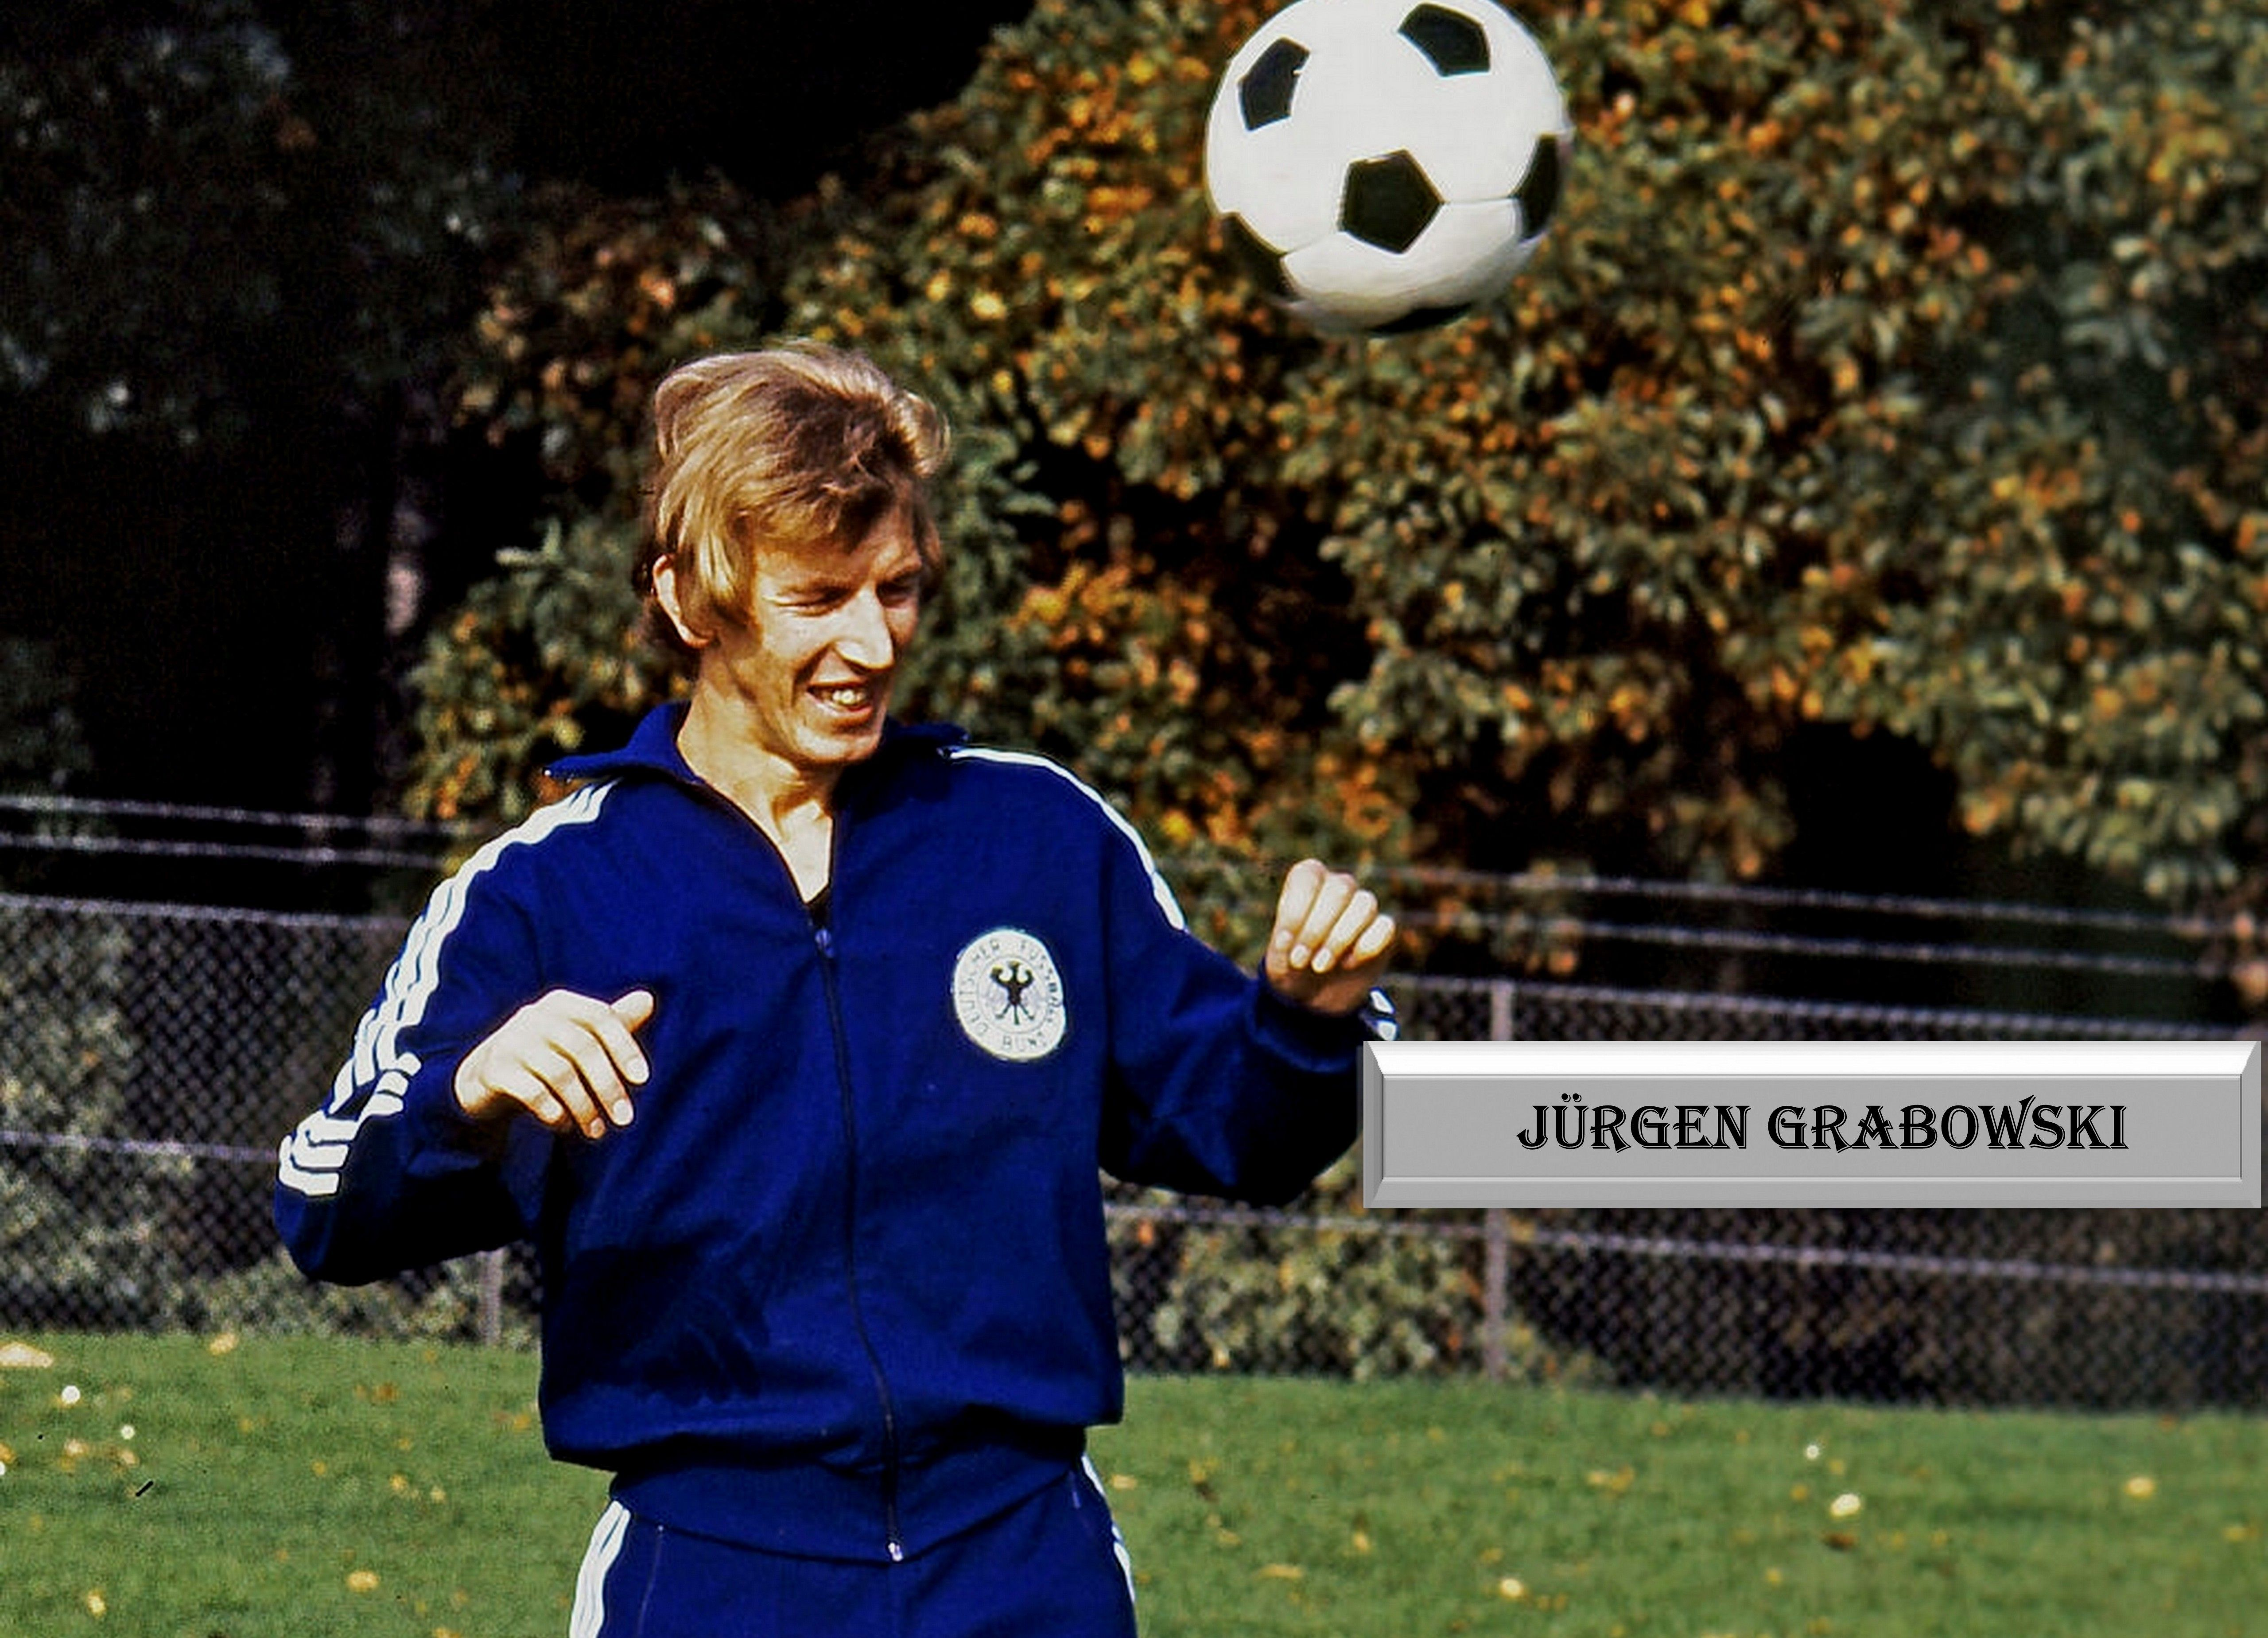 Jurgen Grabowski Dfb Training Http Frankfurter Eintracht